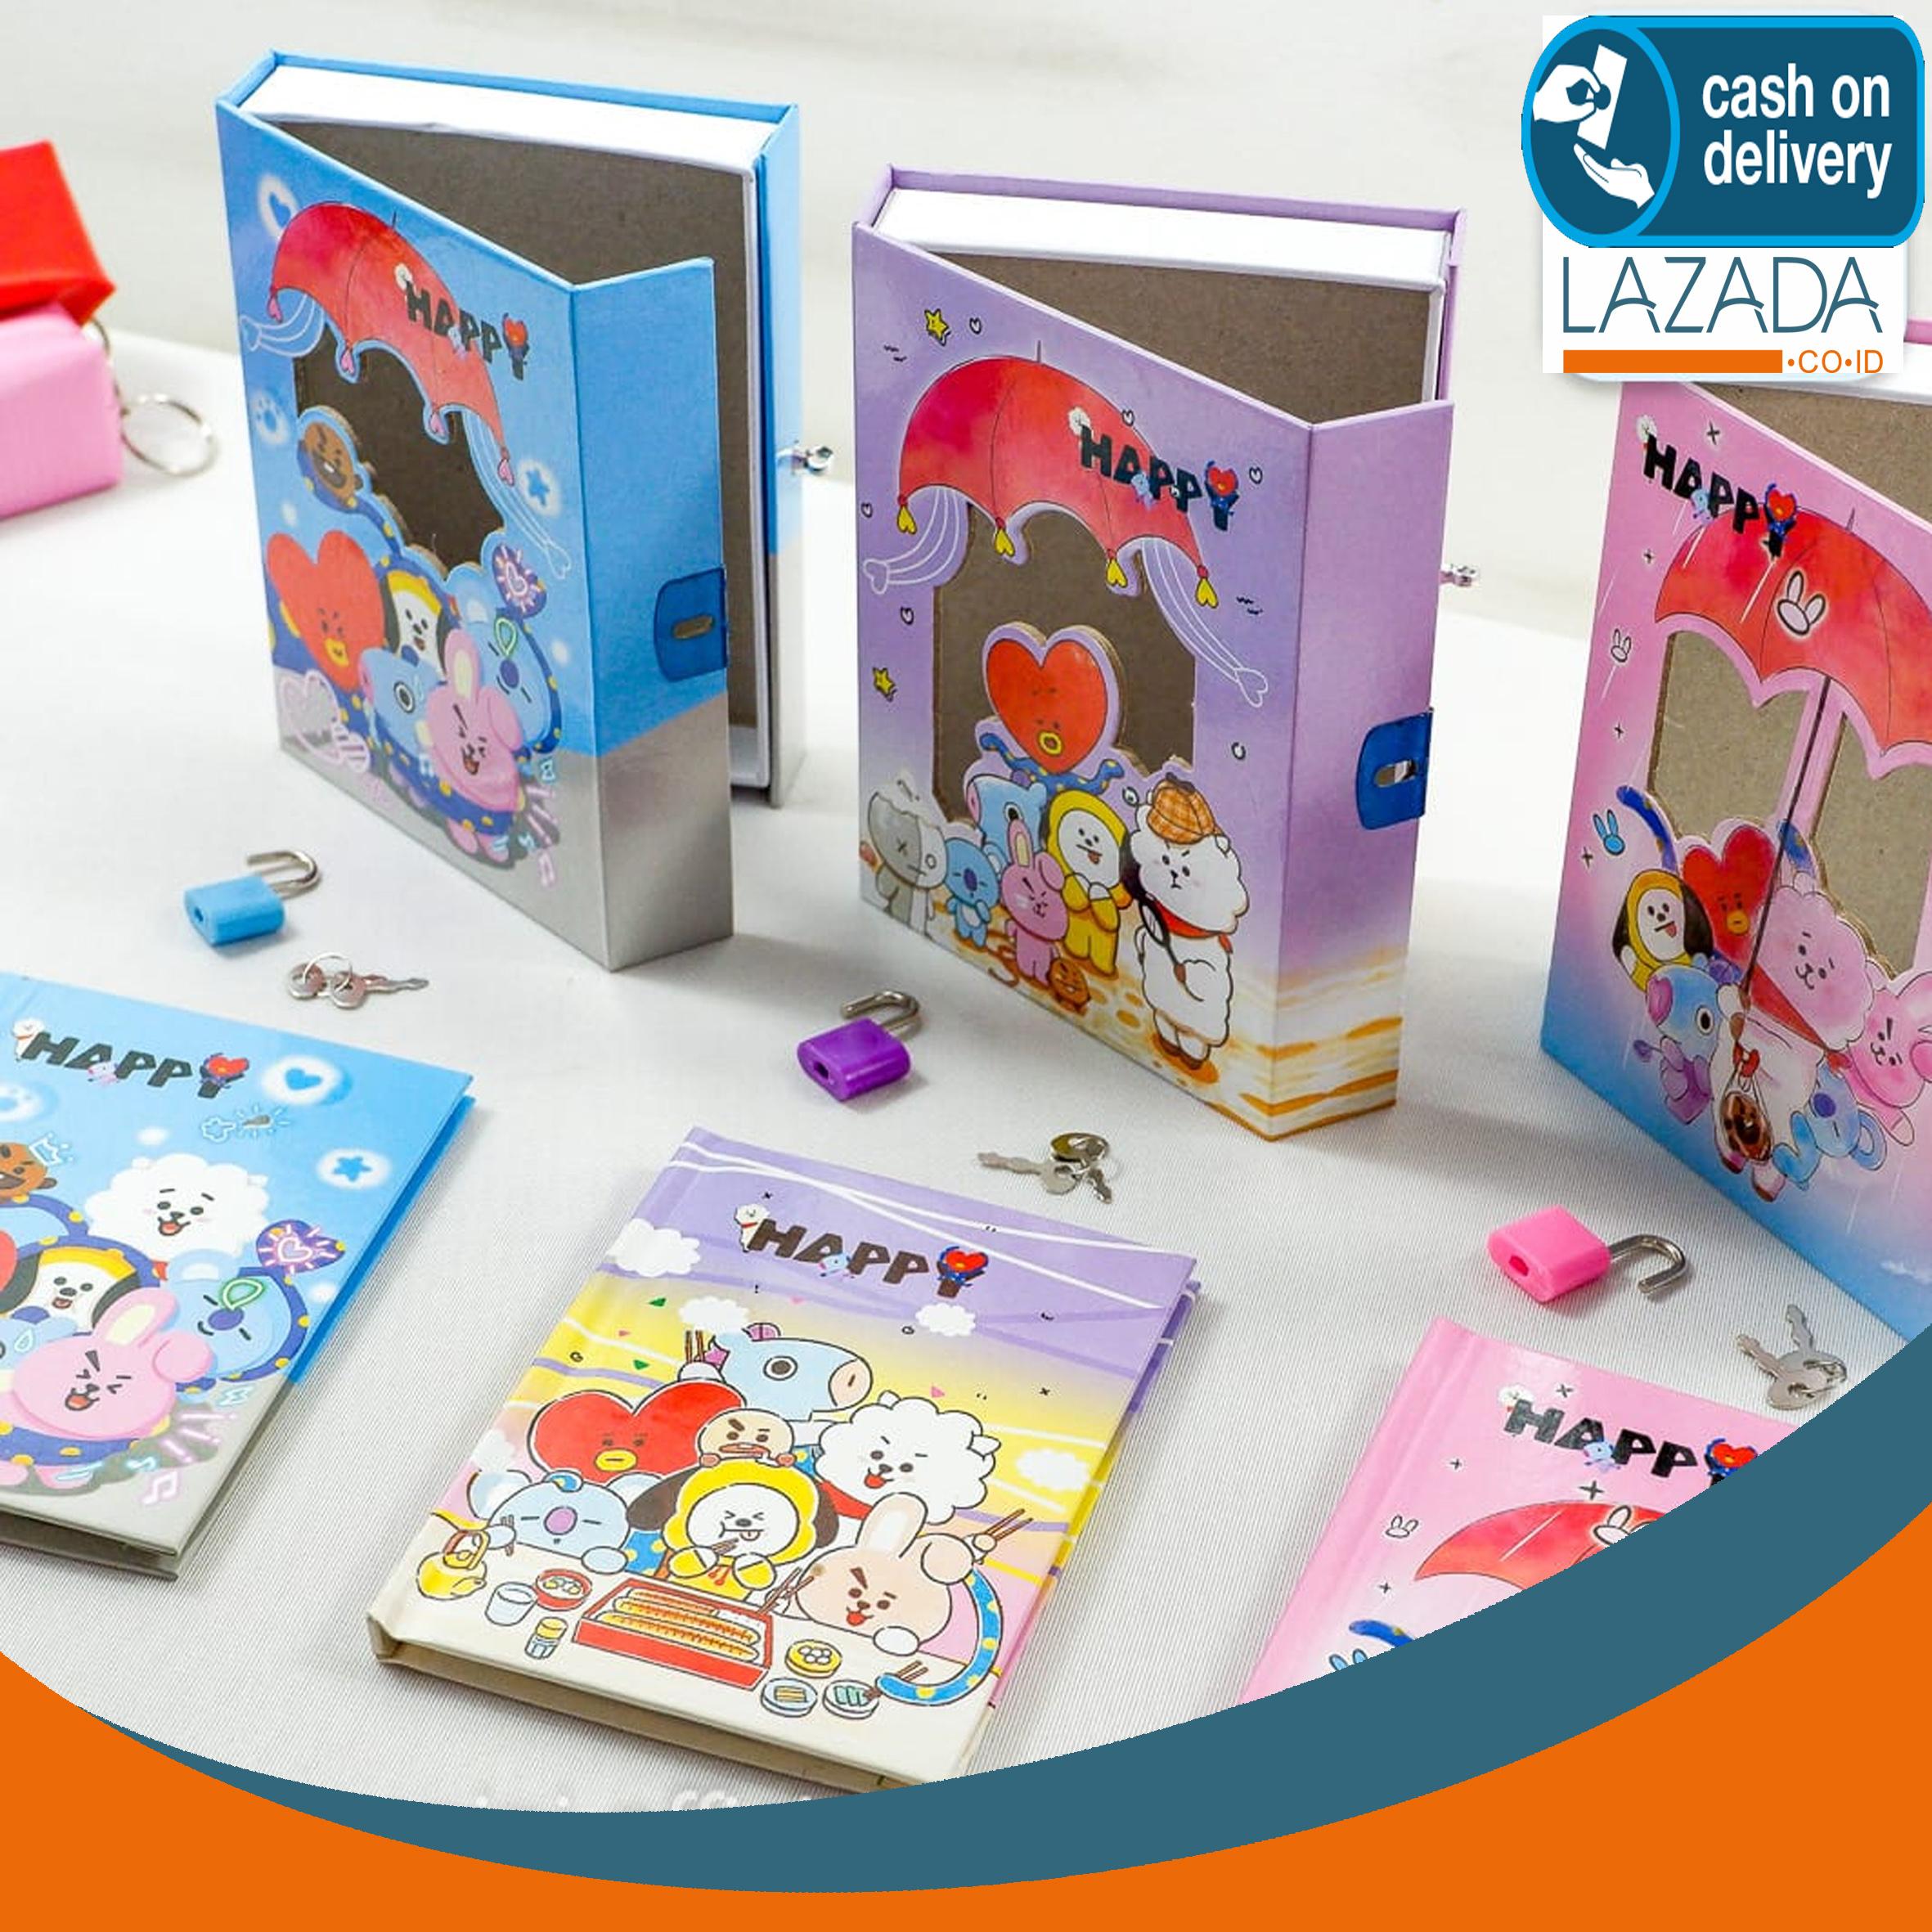 diary bt21 gembok notebook bts bt21 tata cooky chimmy mank koya shooky rj van